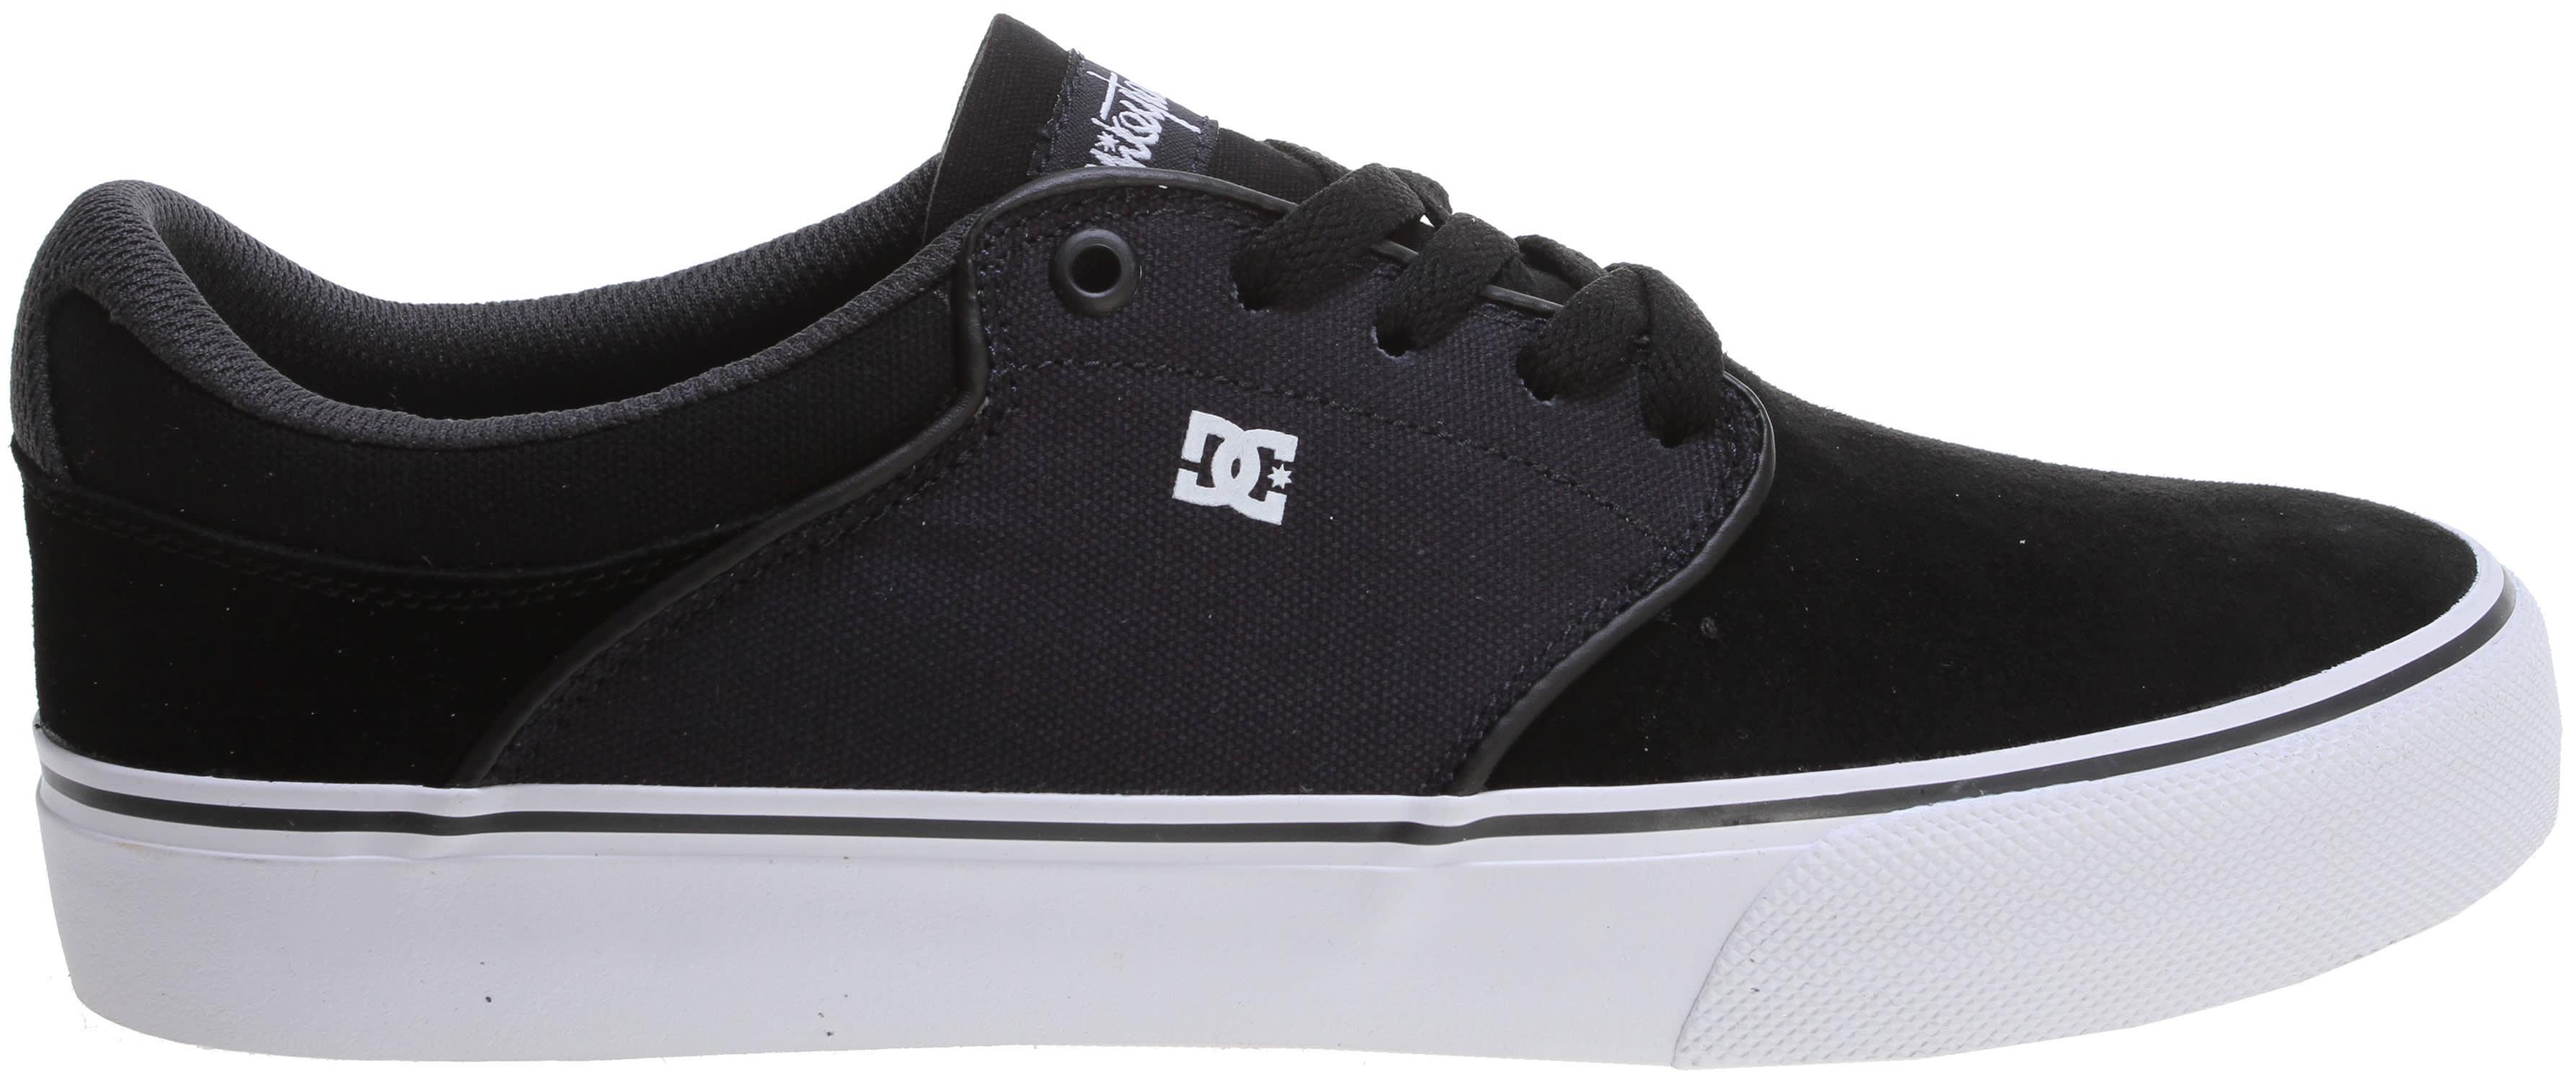 Skate shoes dc - Dc Mike Taylor Vulc Skate Shoes Thumbnail 1